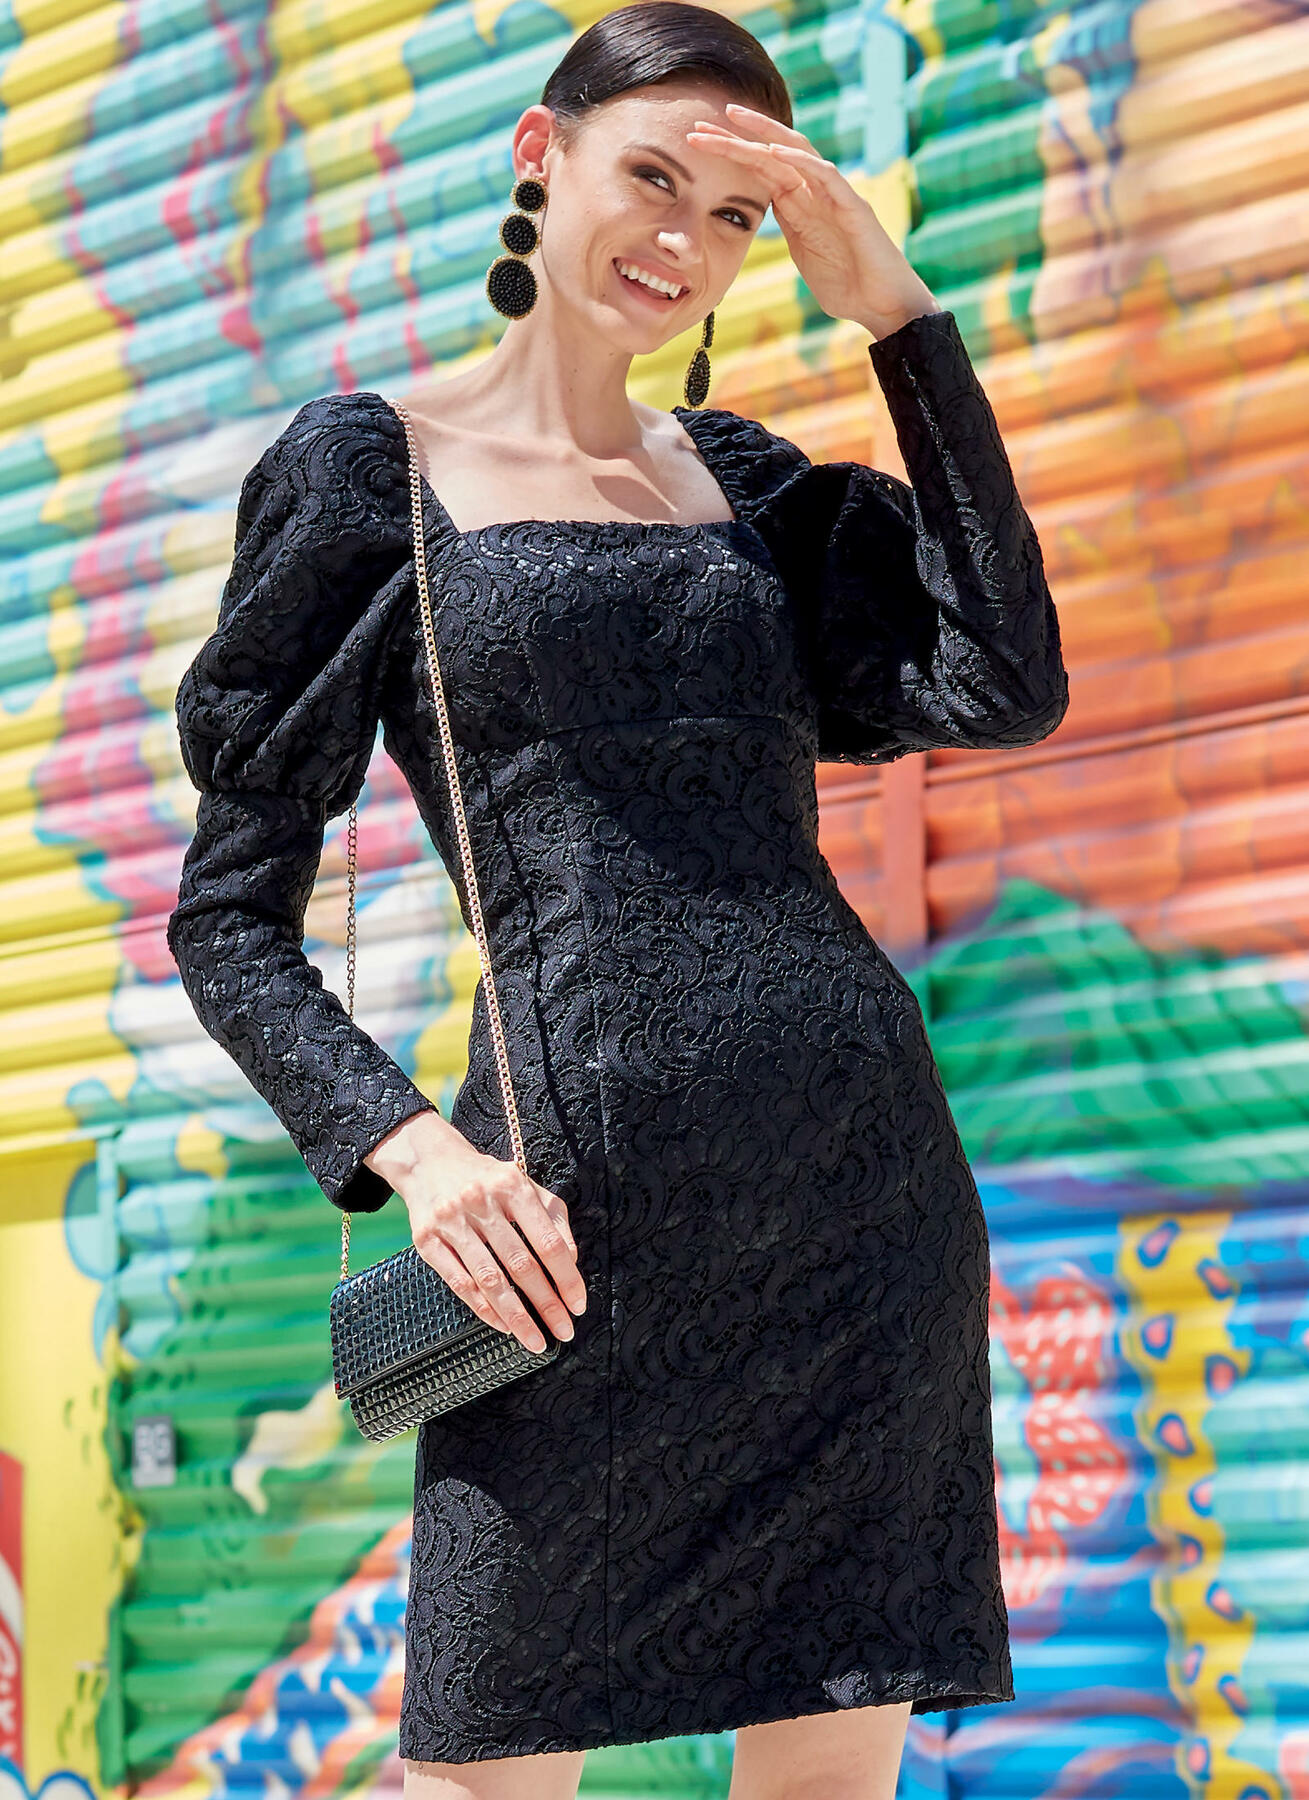 McCalls 8034 Misses Dresses Sewing Pattern Sz 6-14